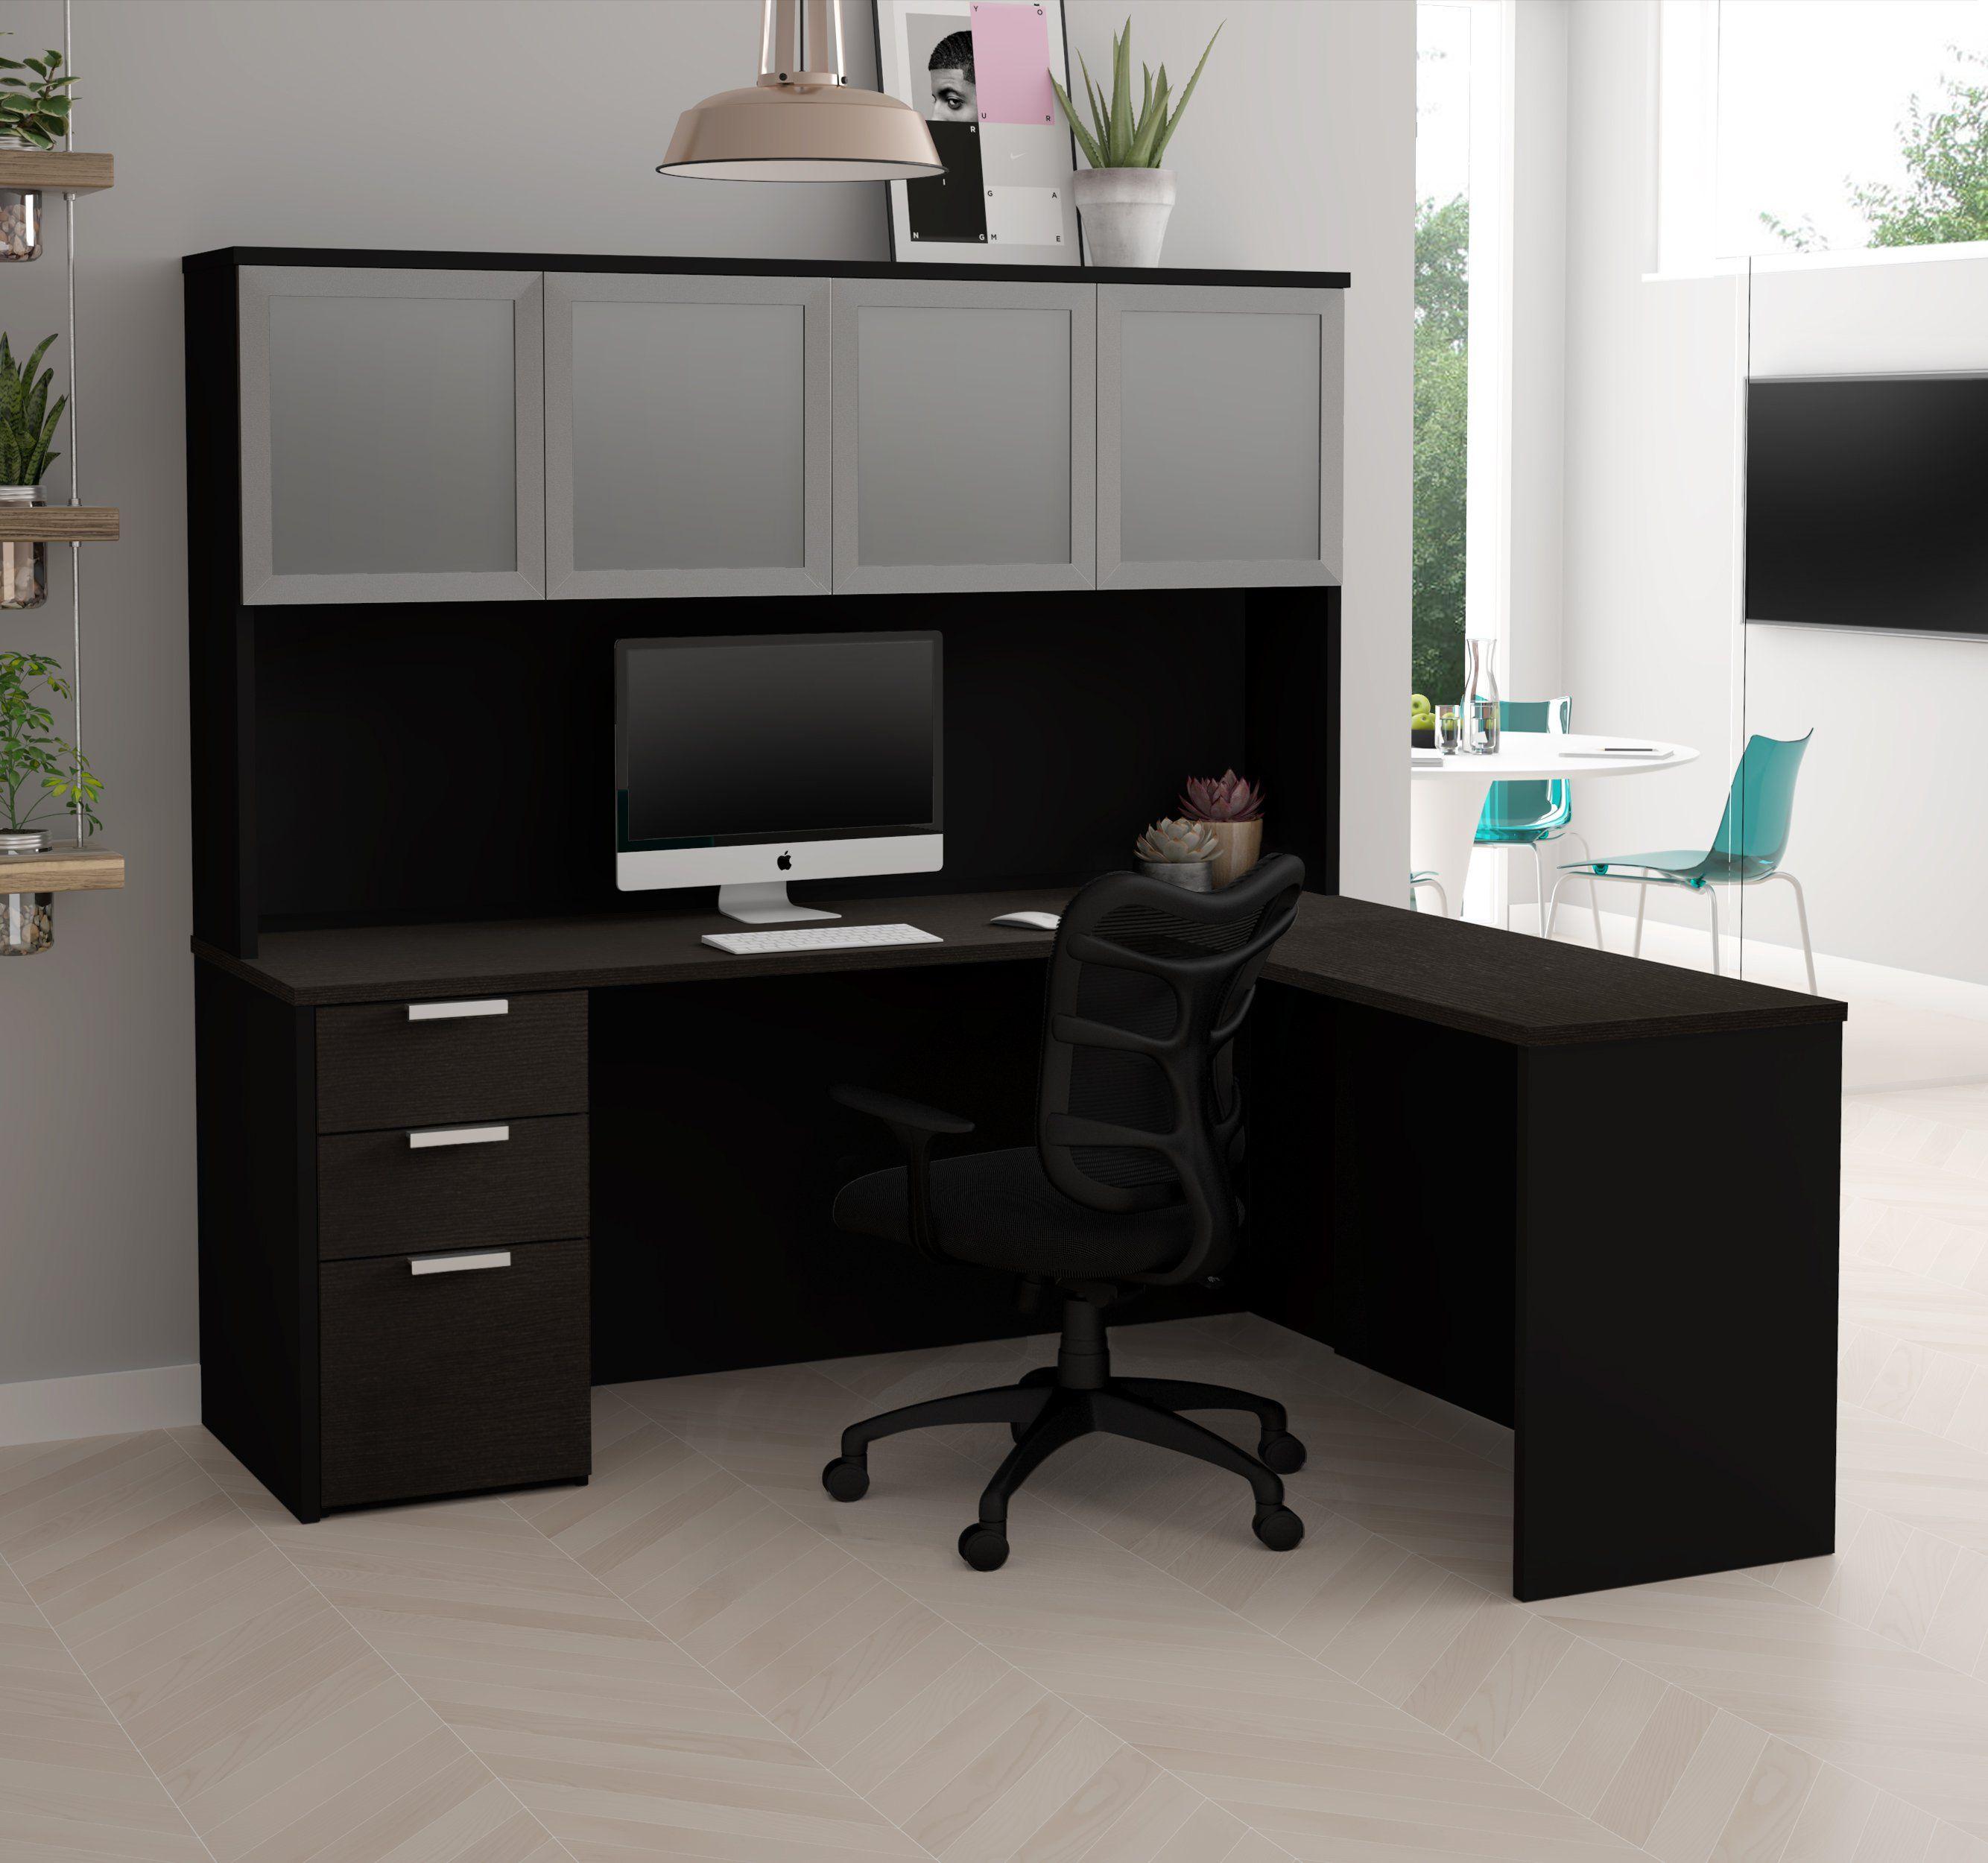 Marvelous Modern L Shaped Desk U0026 Hutch In Deep Gray U0026 Black Finish